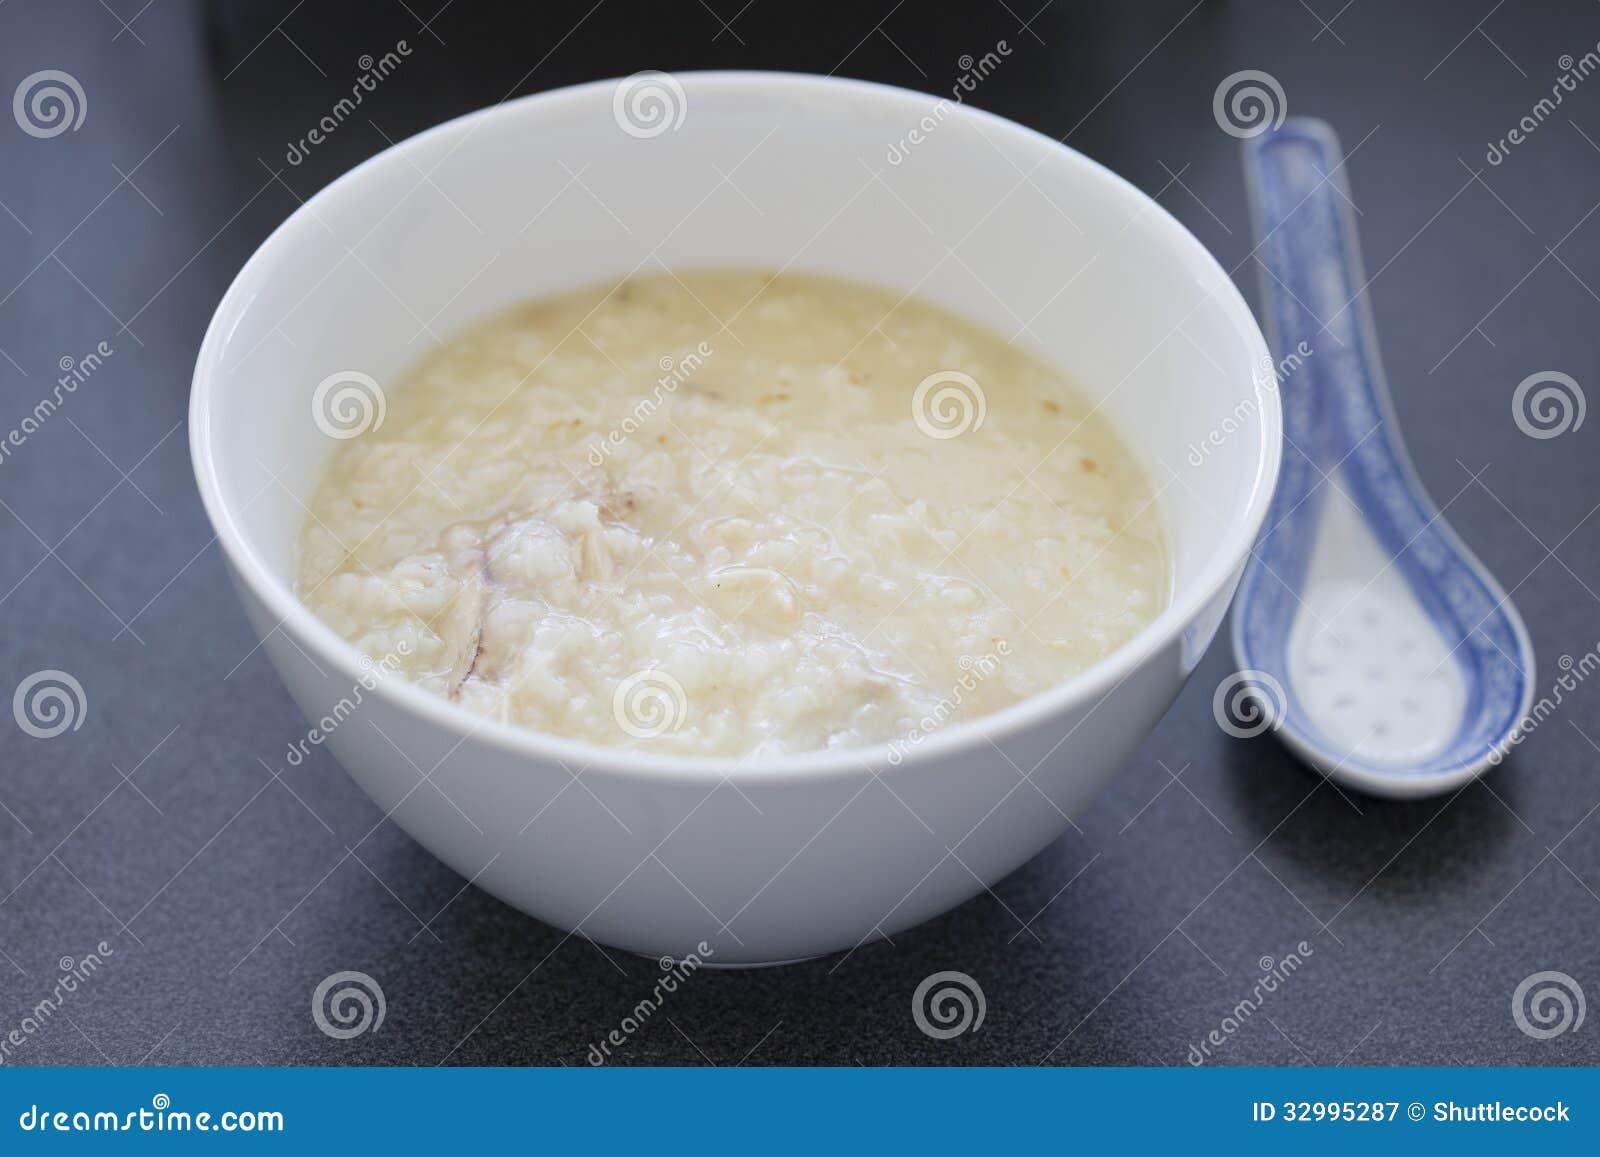 Chinese Rice Porridge Royalty Free Stock Photography